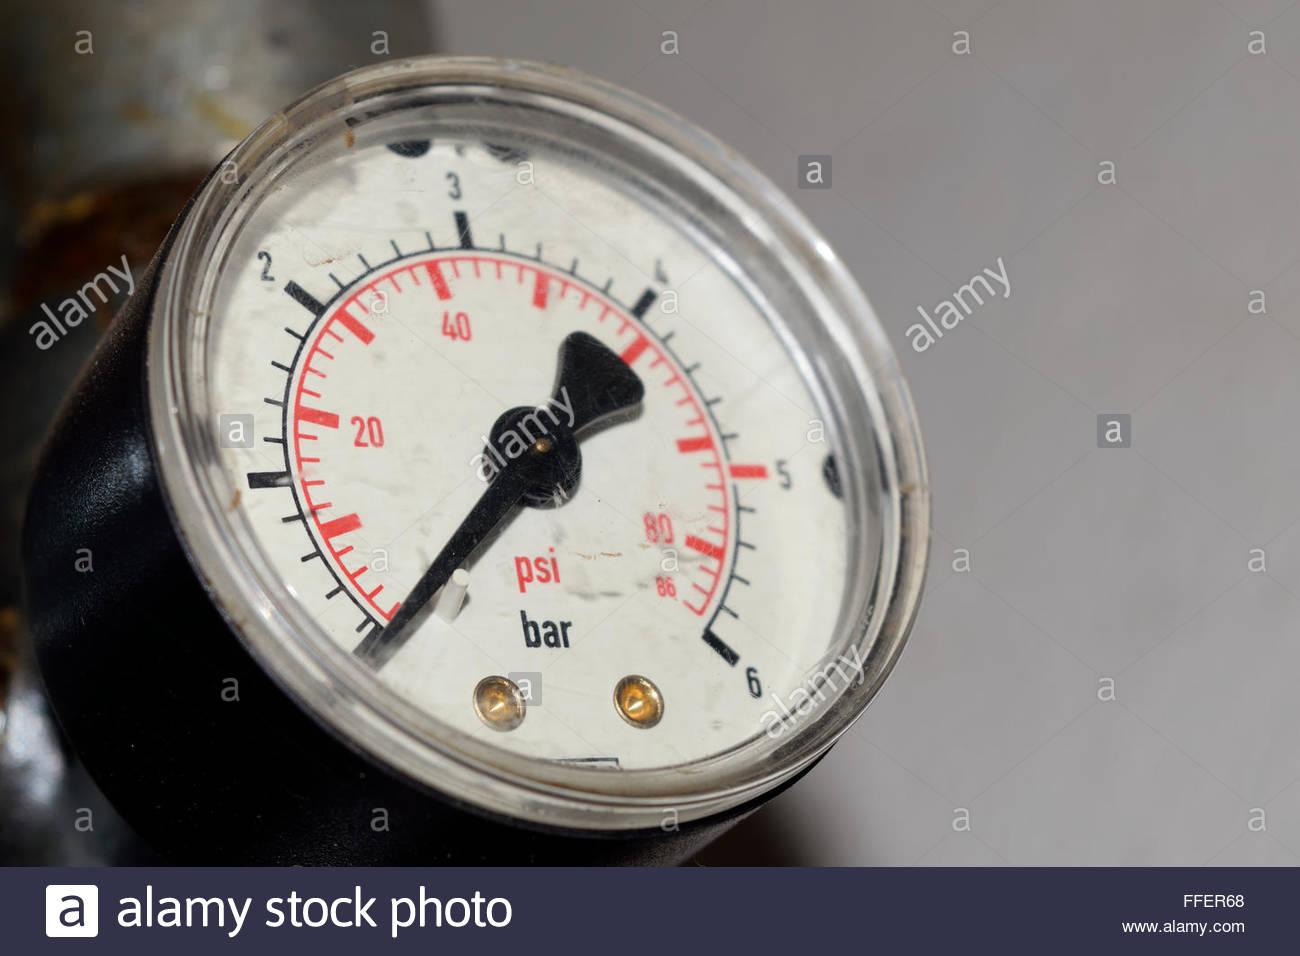 Barometer - Stock Image